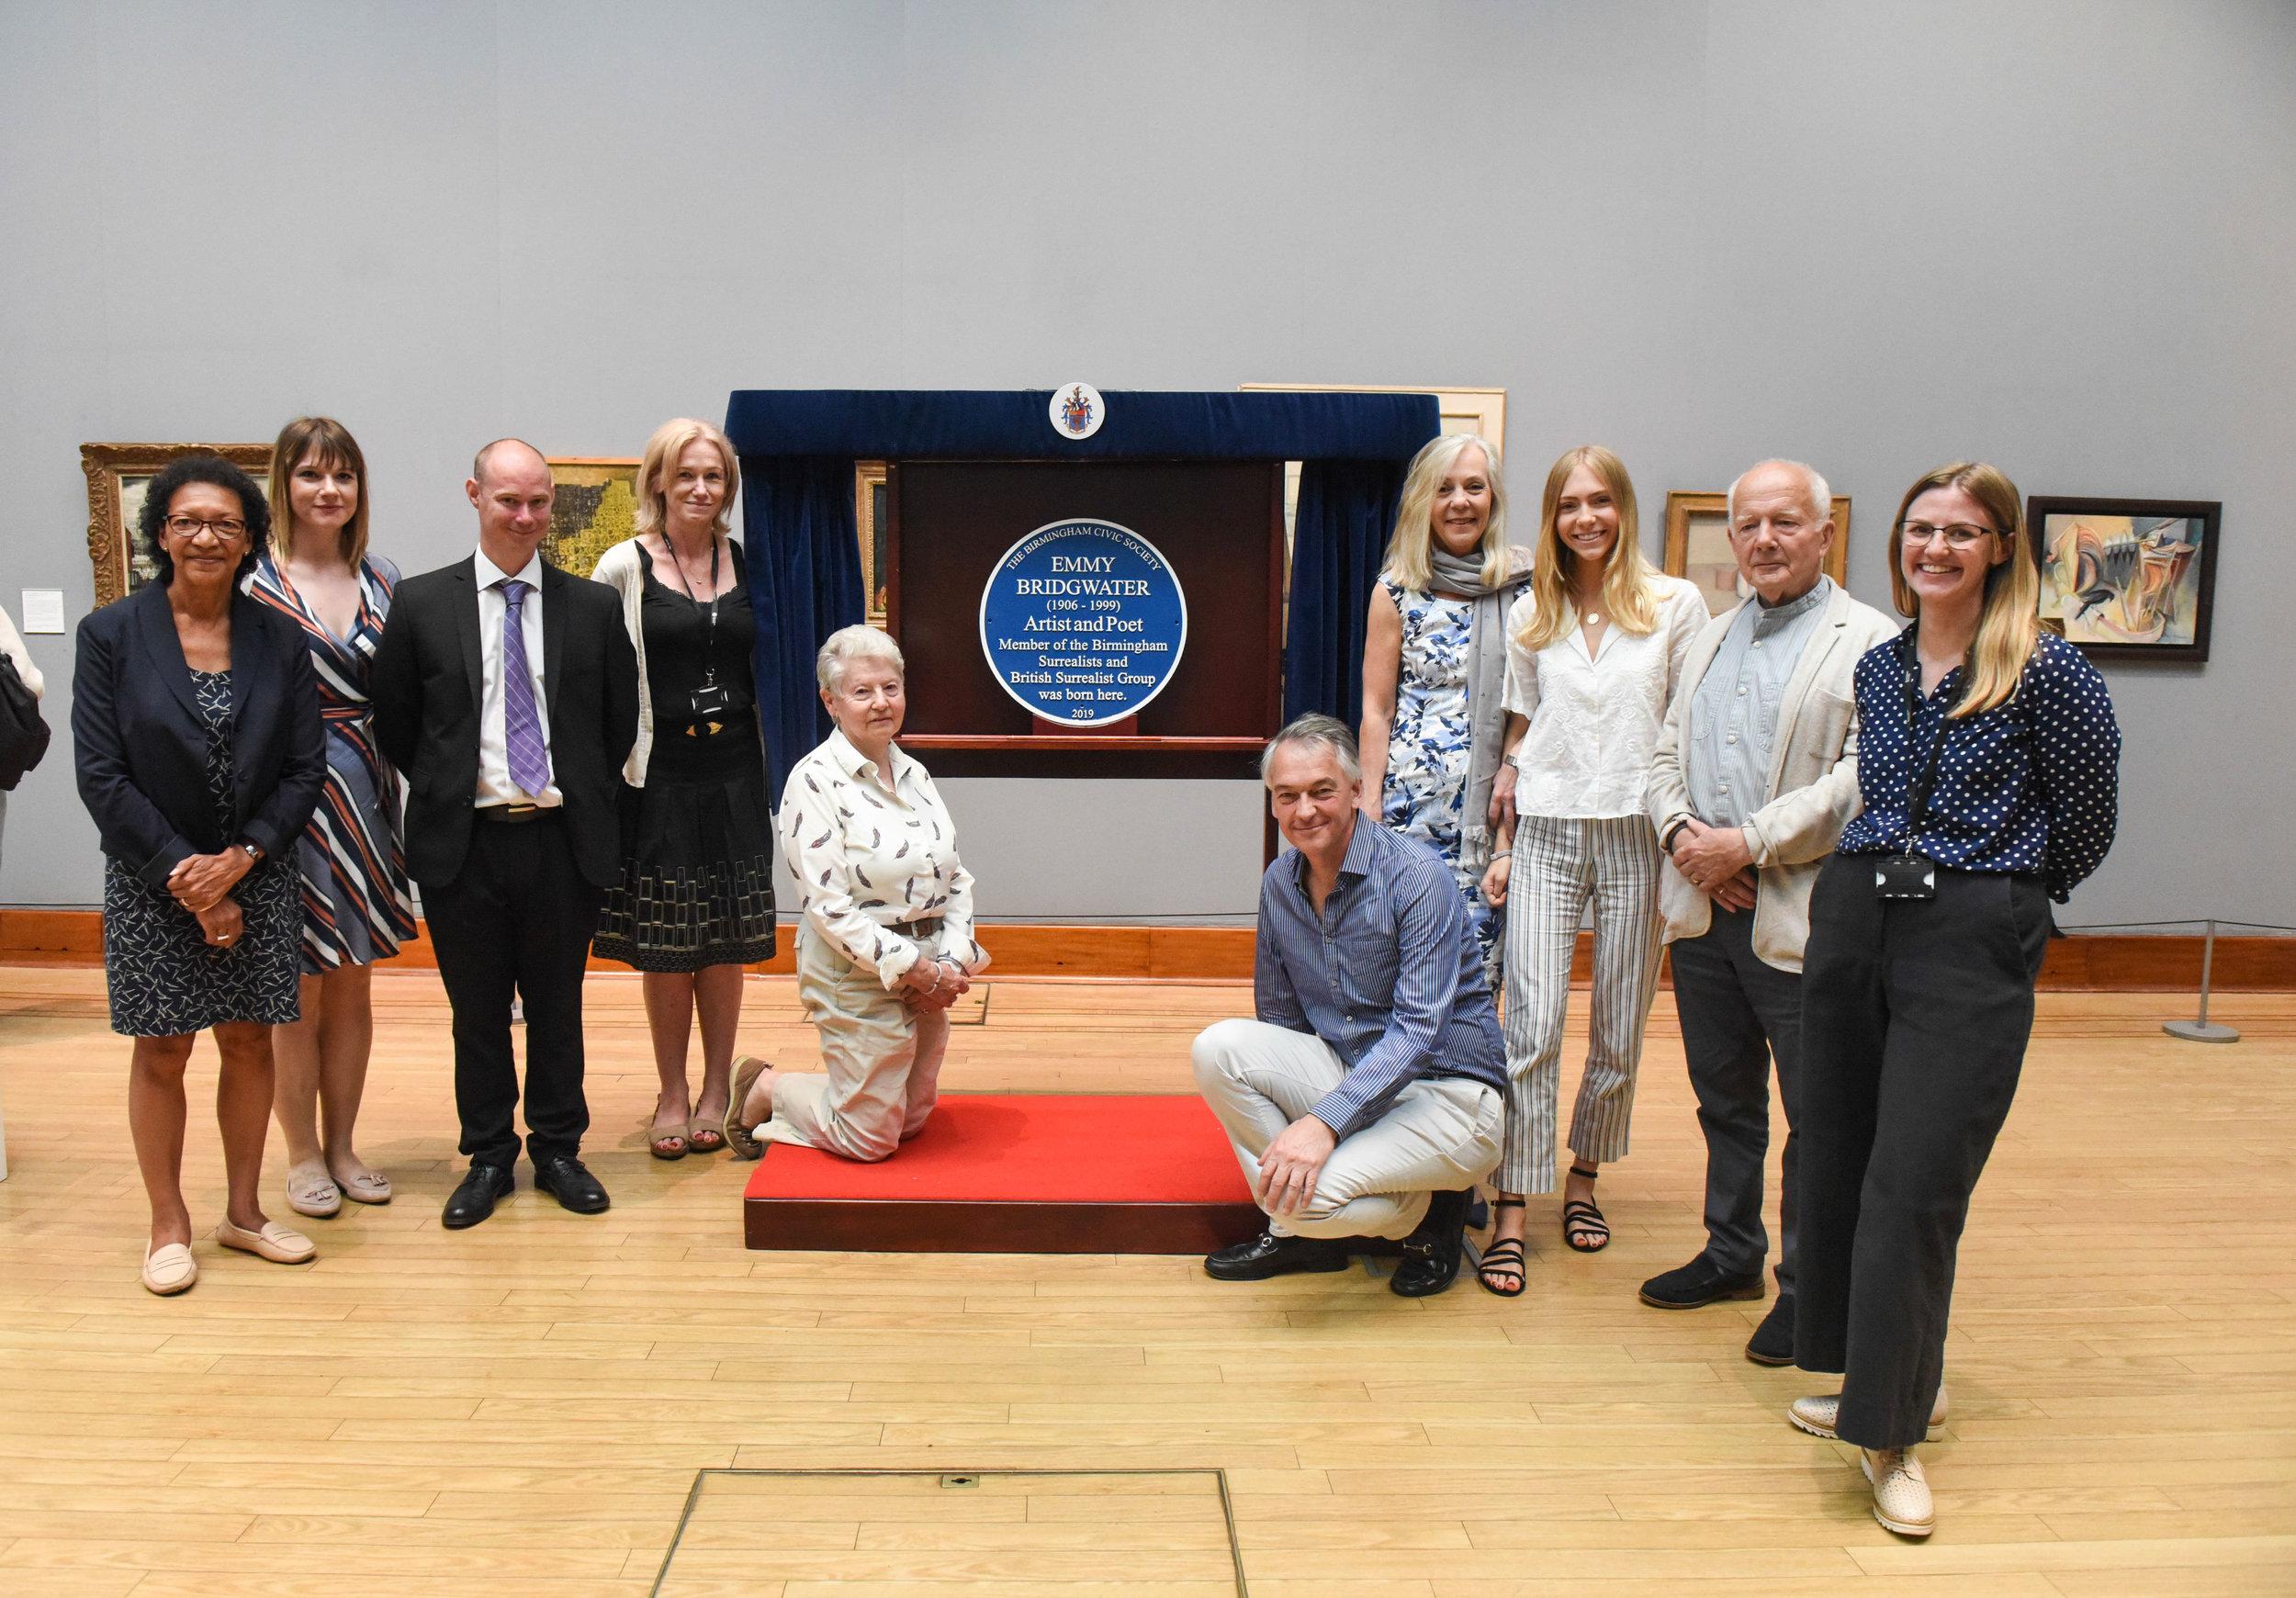 Emmy Bridgwater blue plaque reveal by Anne-Marie Hayes 1.jpg